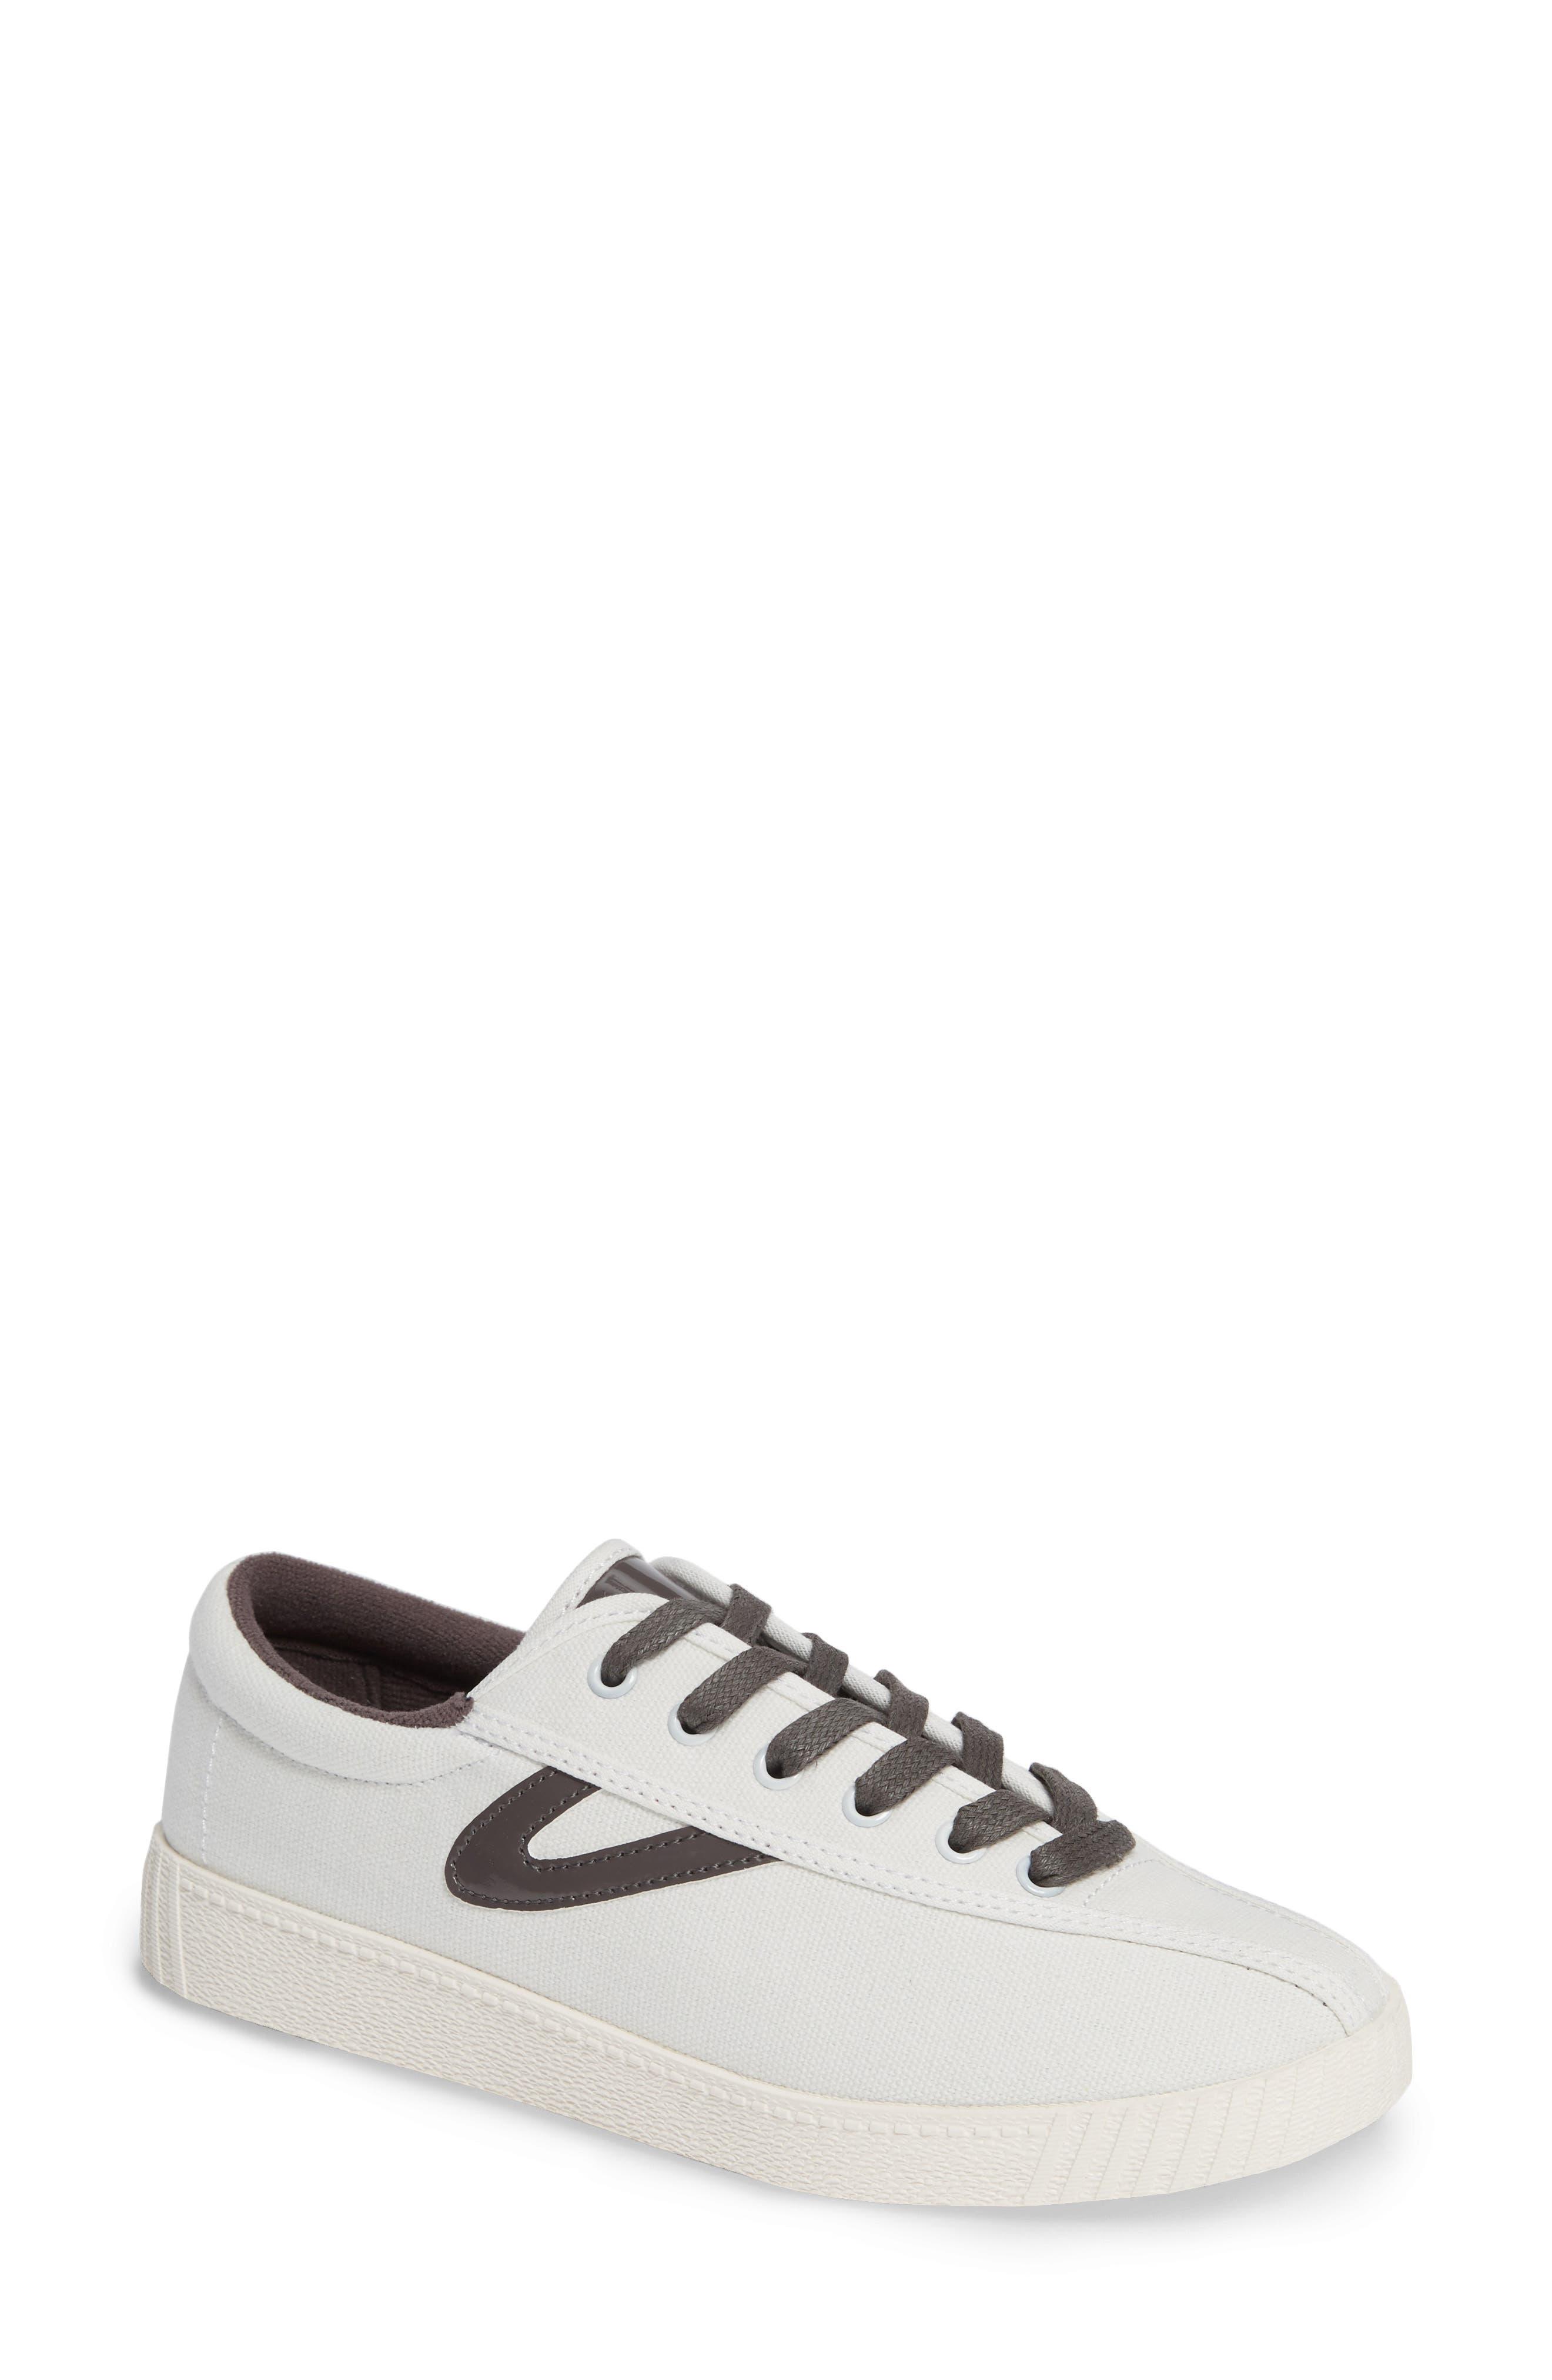 Nylite 28 Plus Sneaker, Vintage White/ Inox